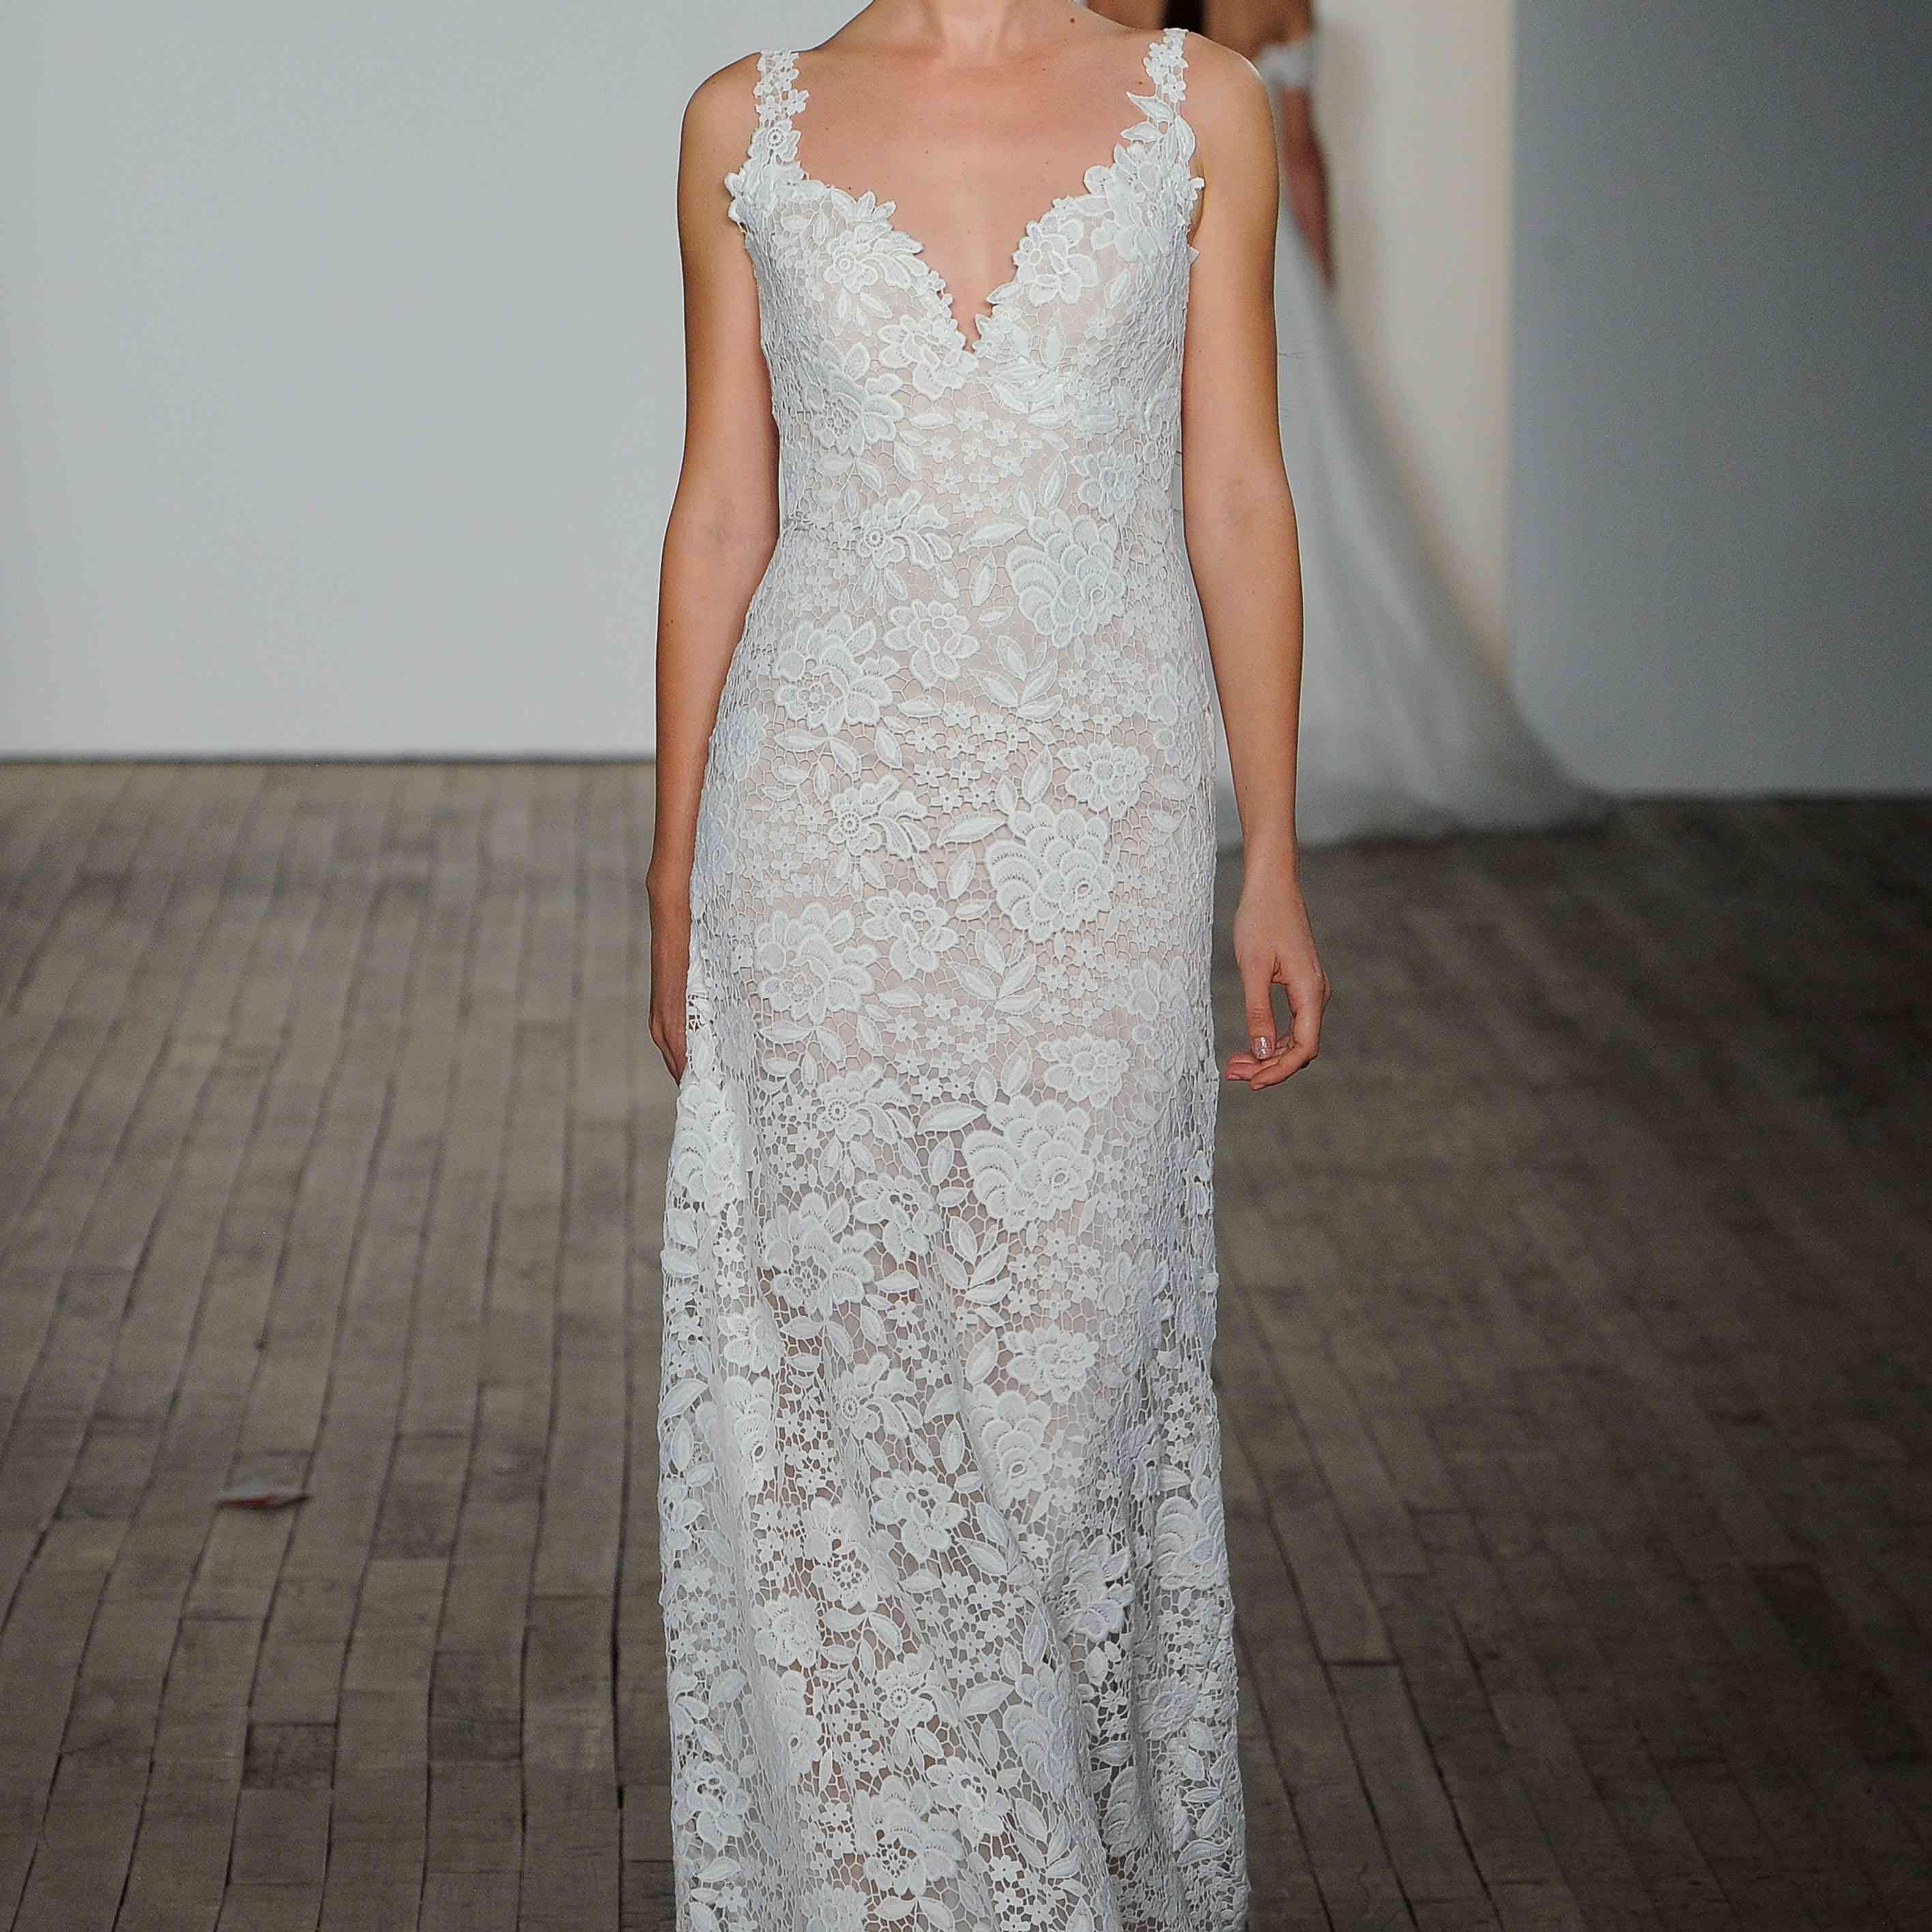 Atlas lace wedding dress